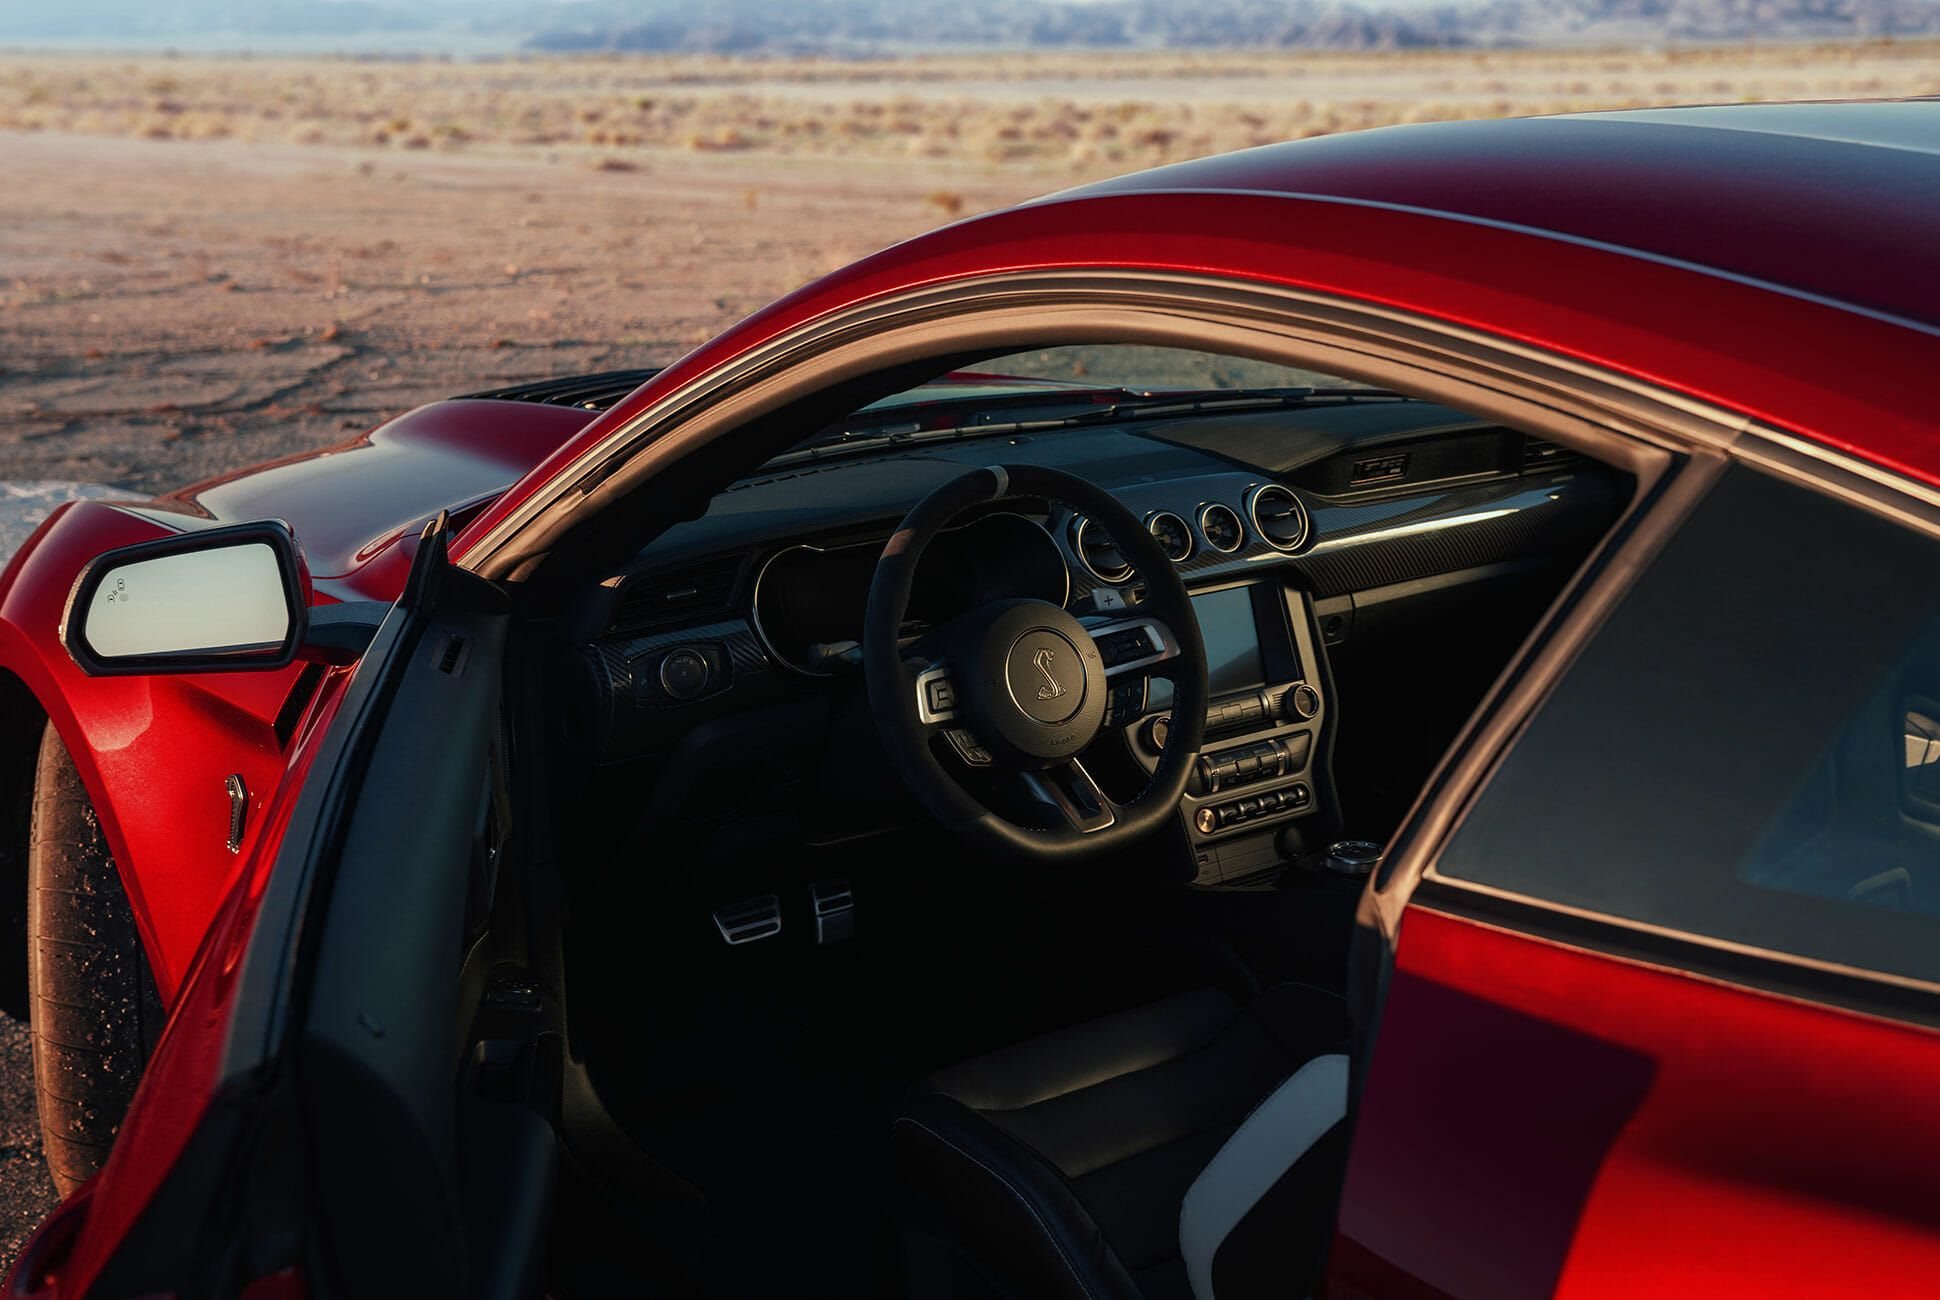 2020-Ford-Mustang-Shelby-GT500-gear-patrol-slide-5